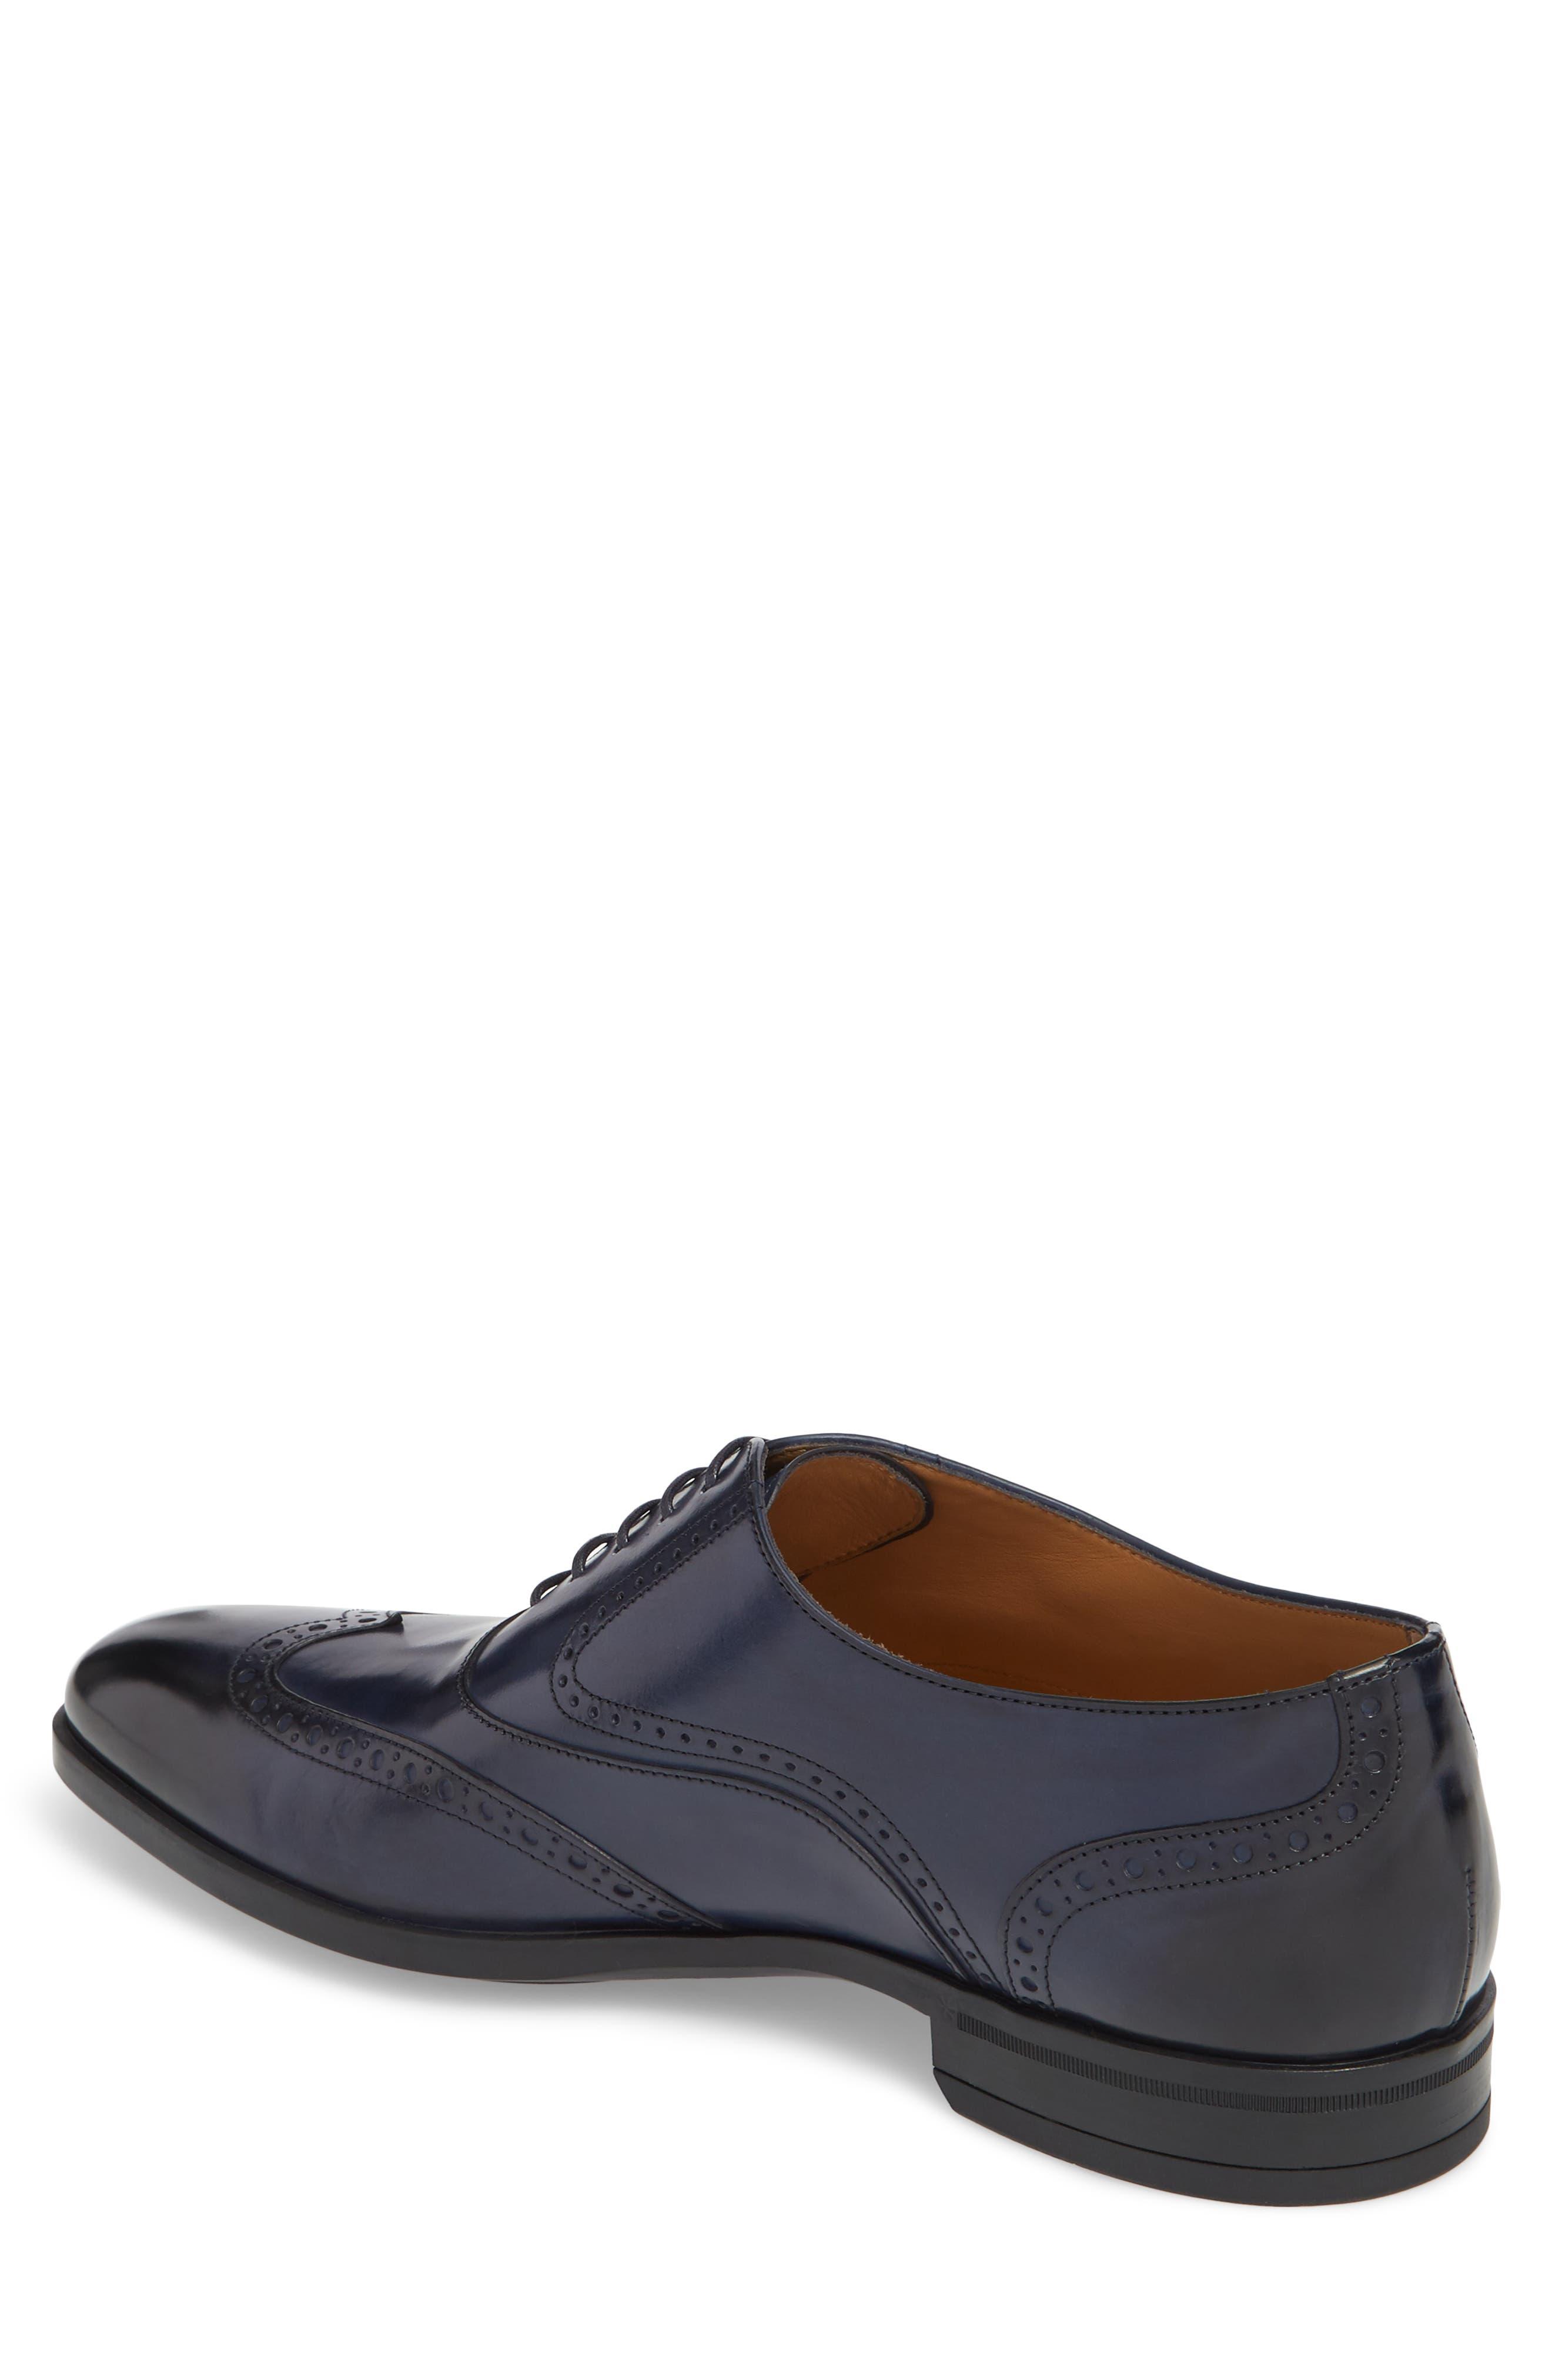 Portland Wingtip,                             Alternate thumbnail 2, color,                             Dark Blue Leather